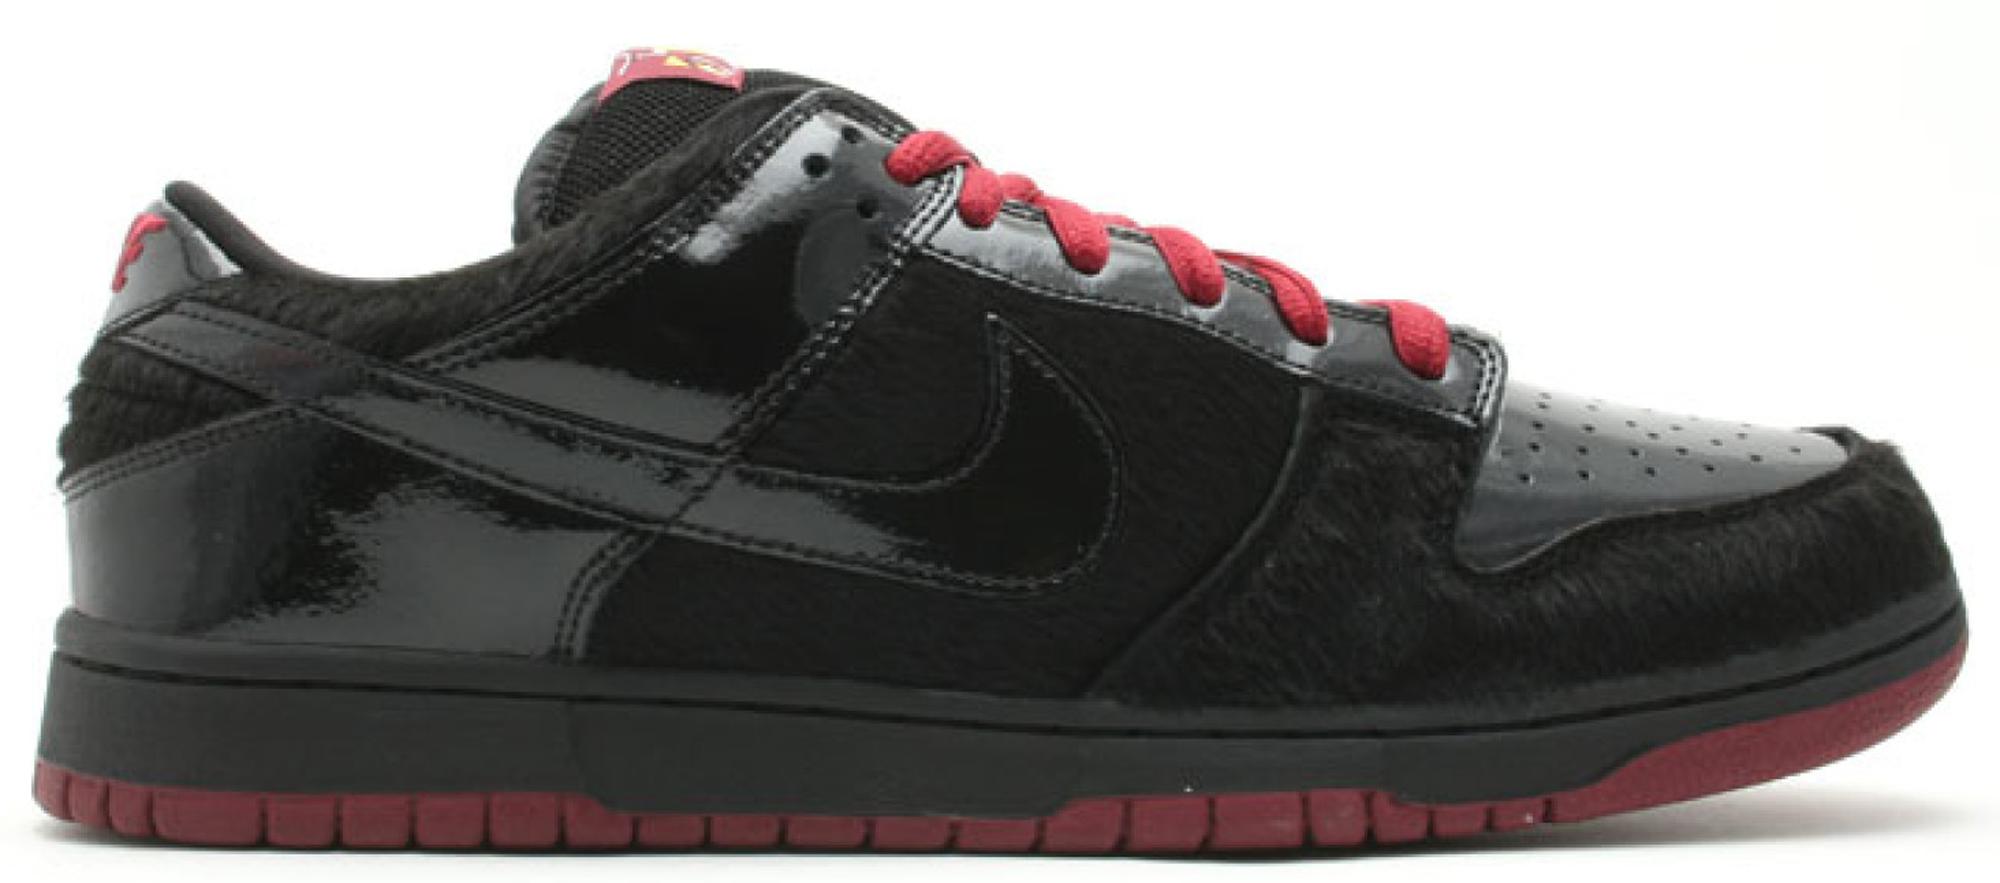 Nike SB Dunk Low Mafia